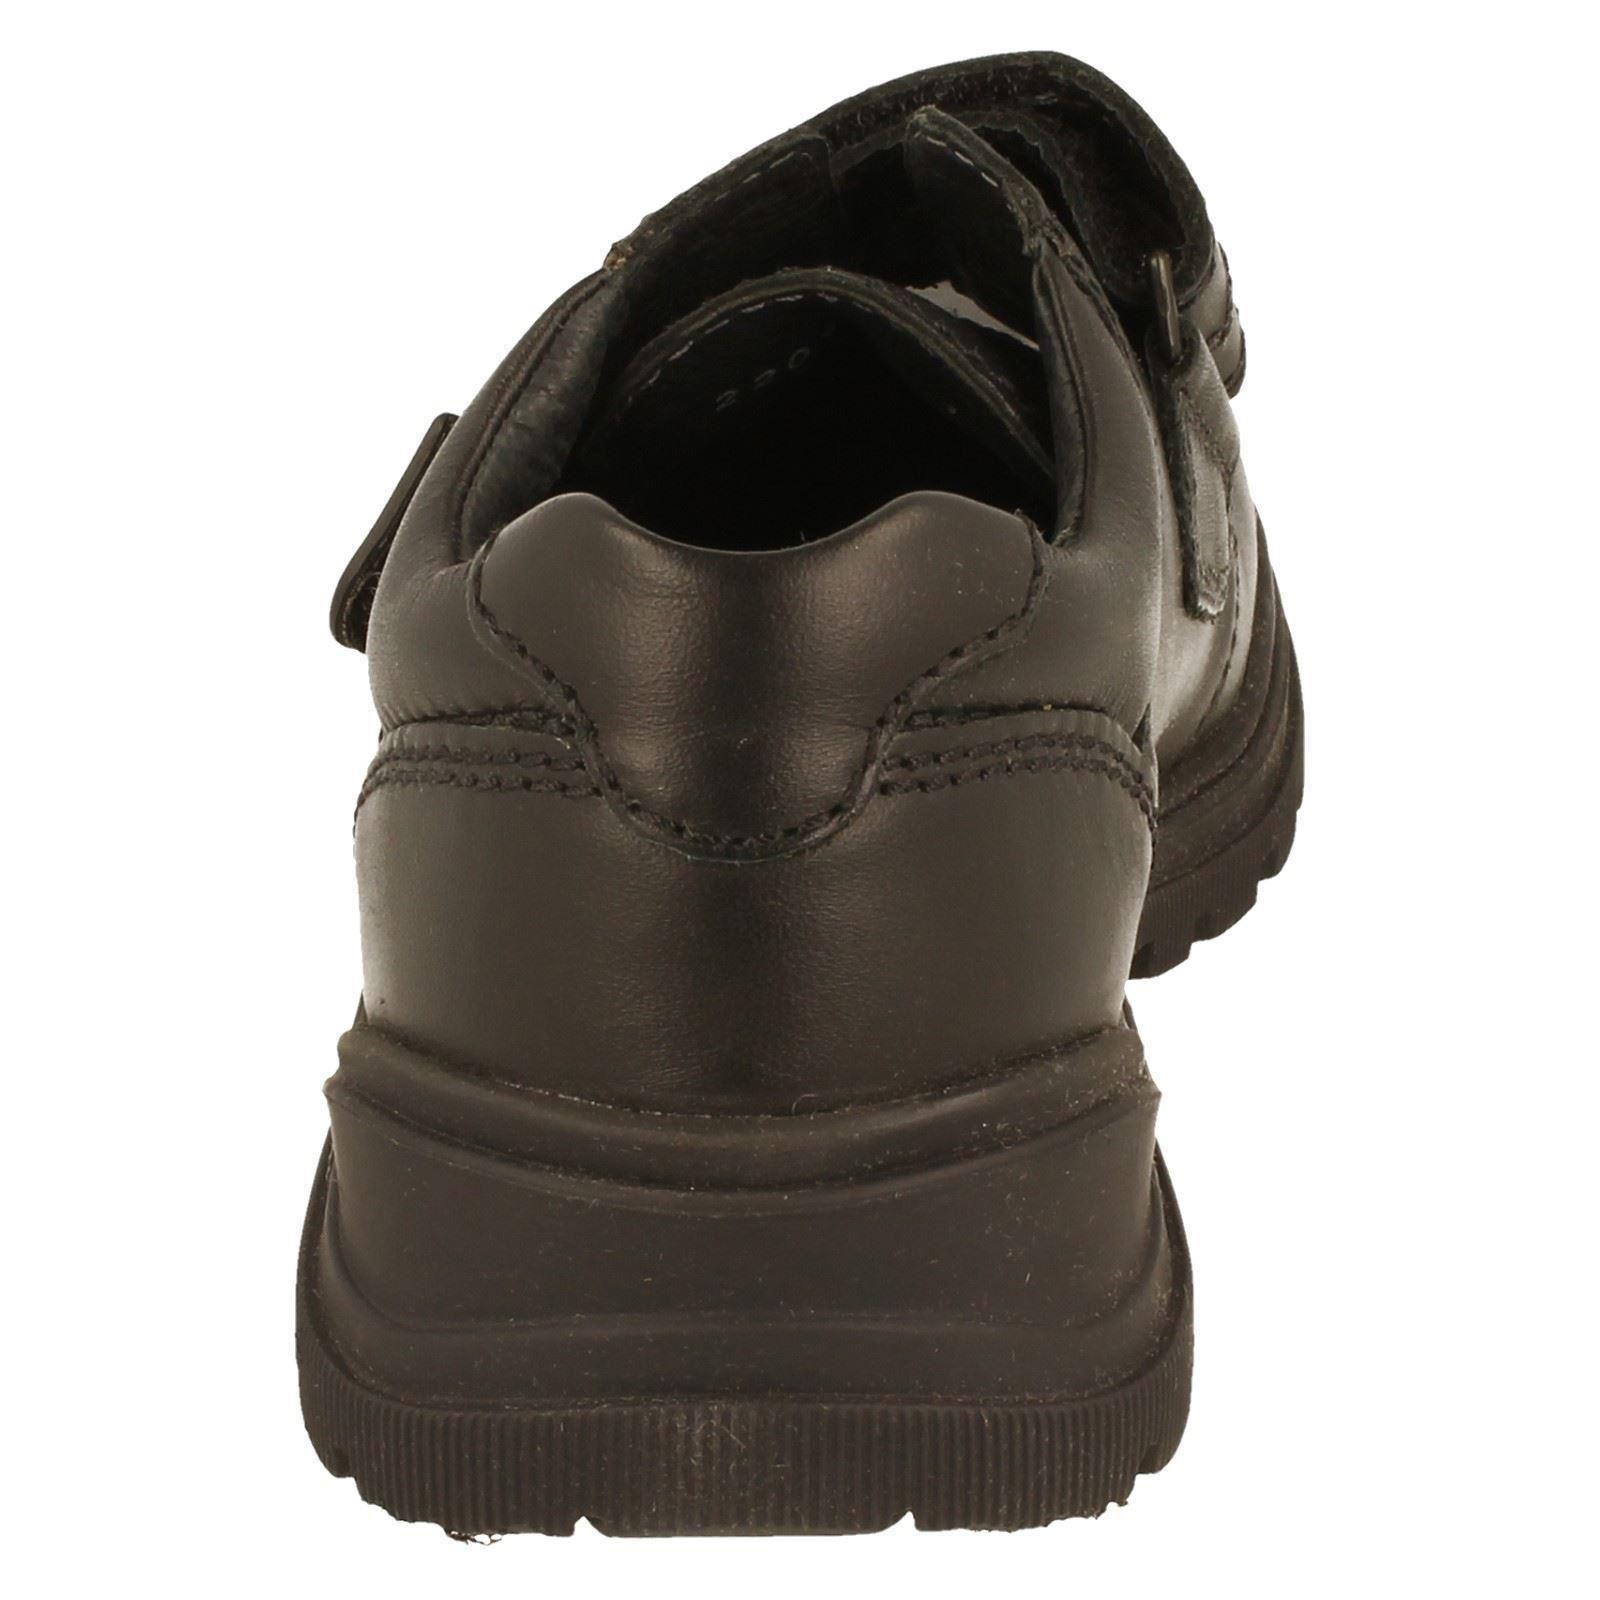 Chicos START Rite Escuela Zapatos Etiqueta Campbell-W